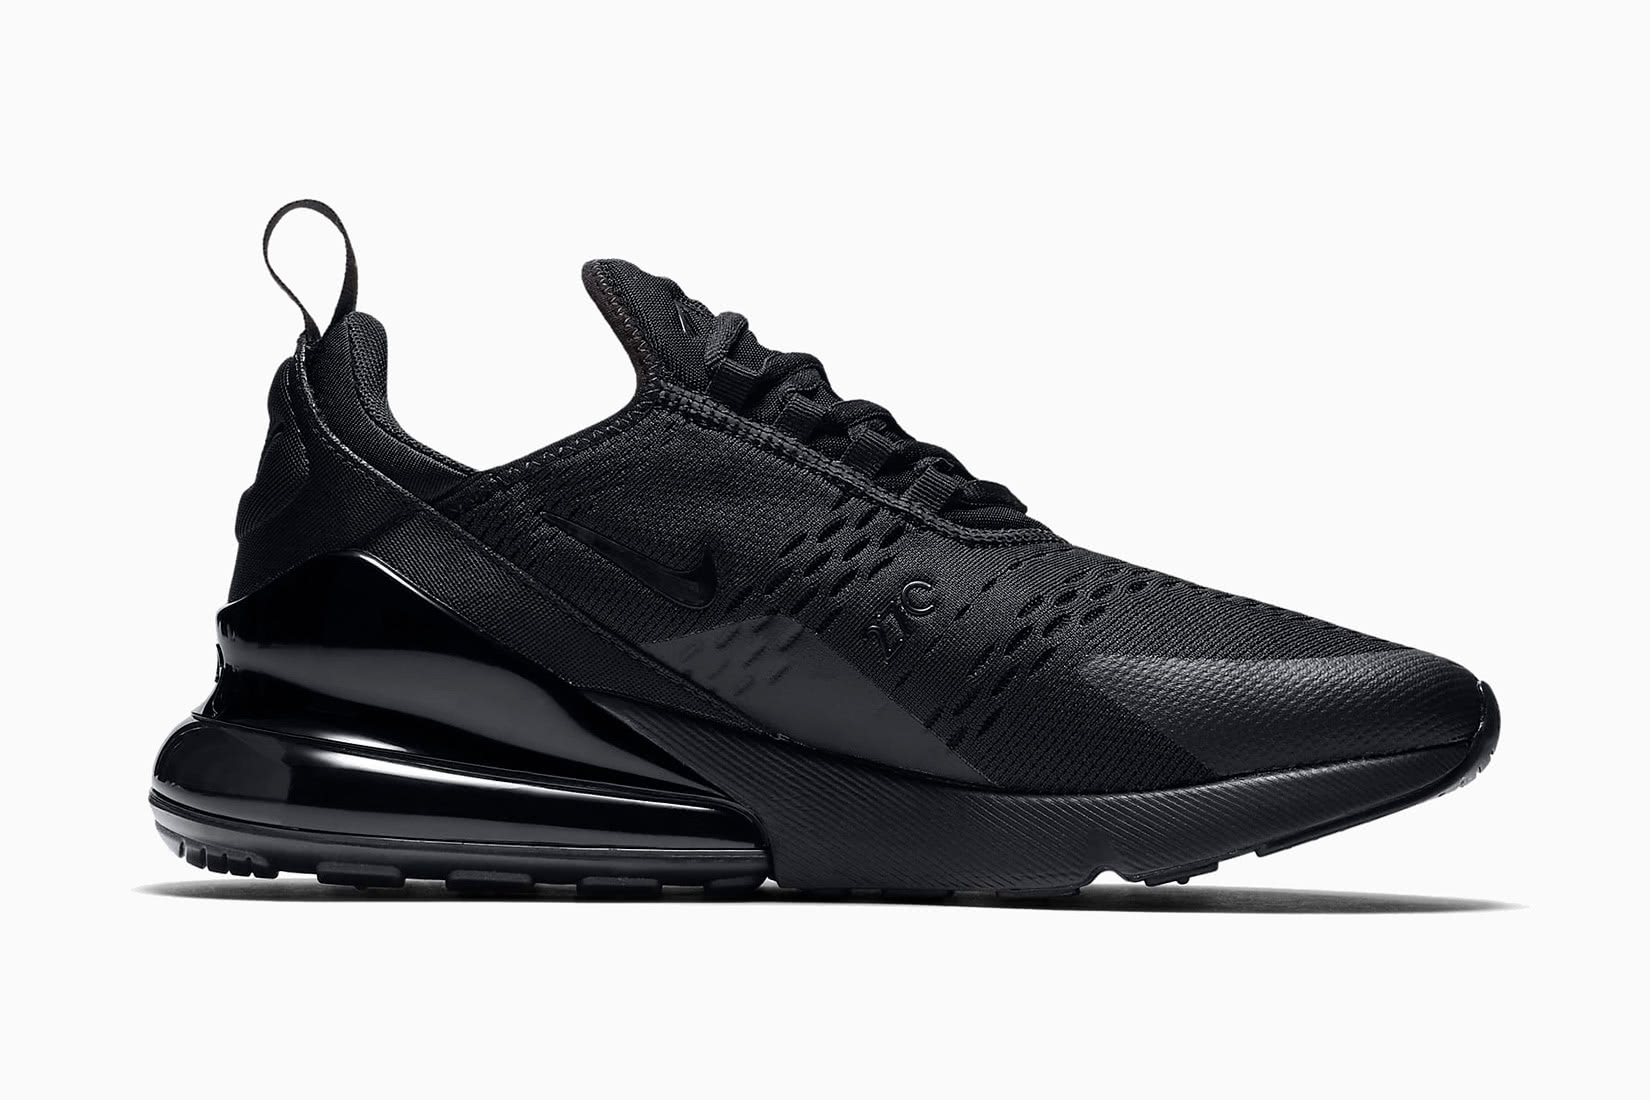 best selling men sneakers nike air max review - Luxe Digital